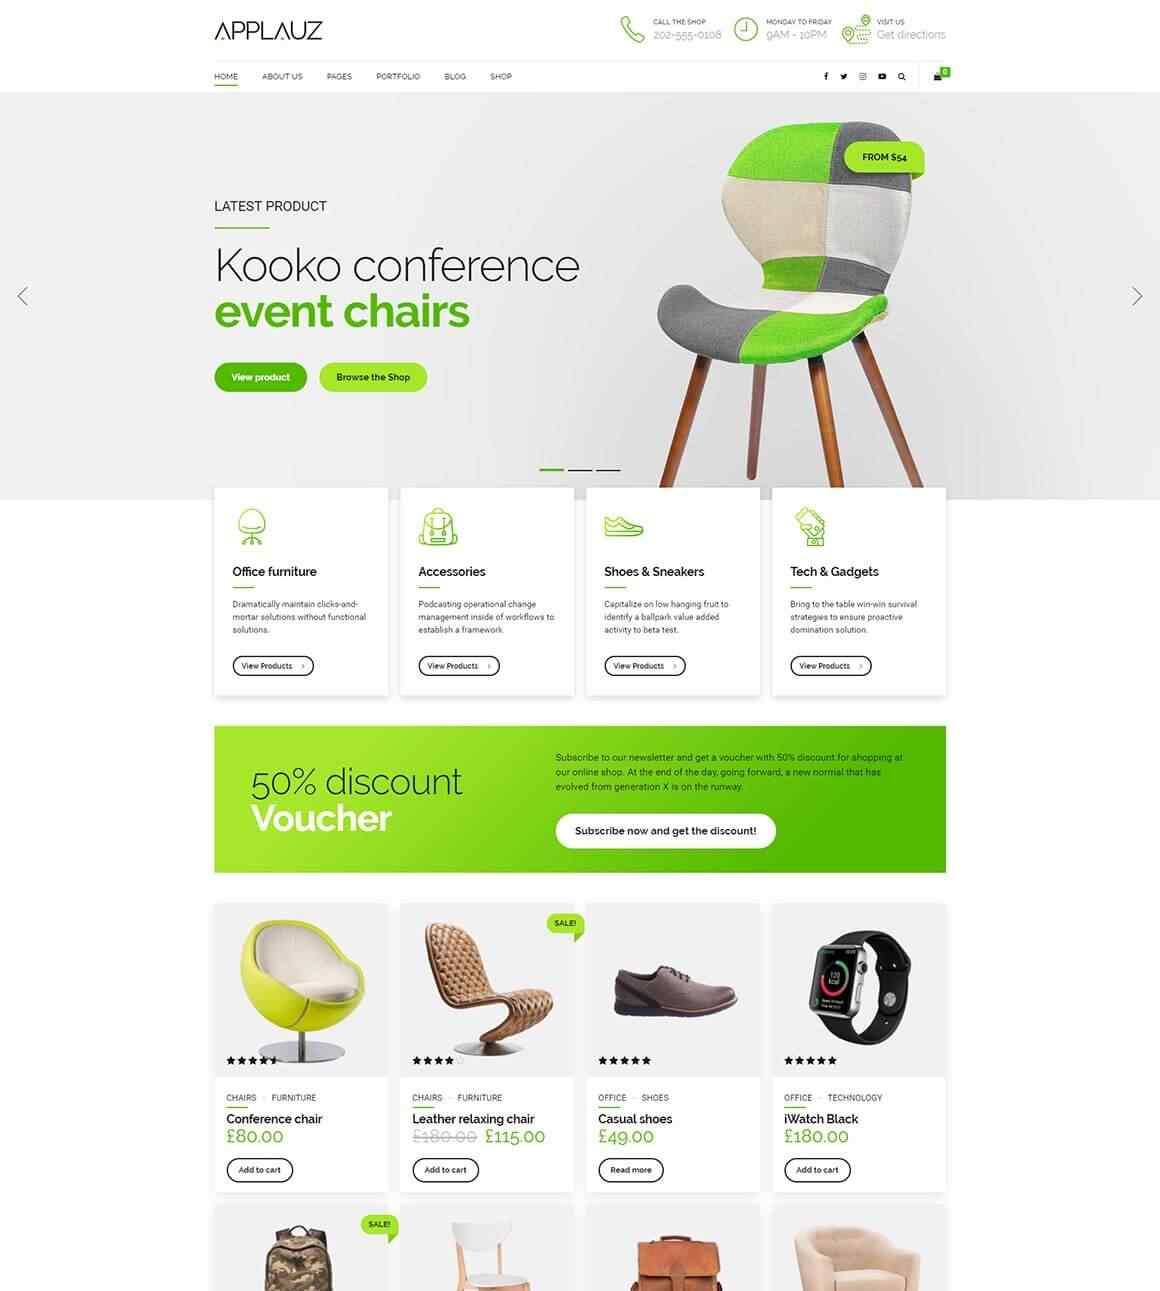 https://infiniteroles.com/wp-content/uploads/2017/11/Screenshot-Shop.jpg